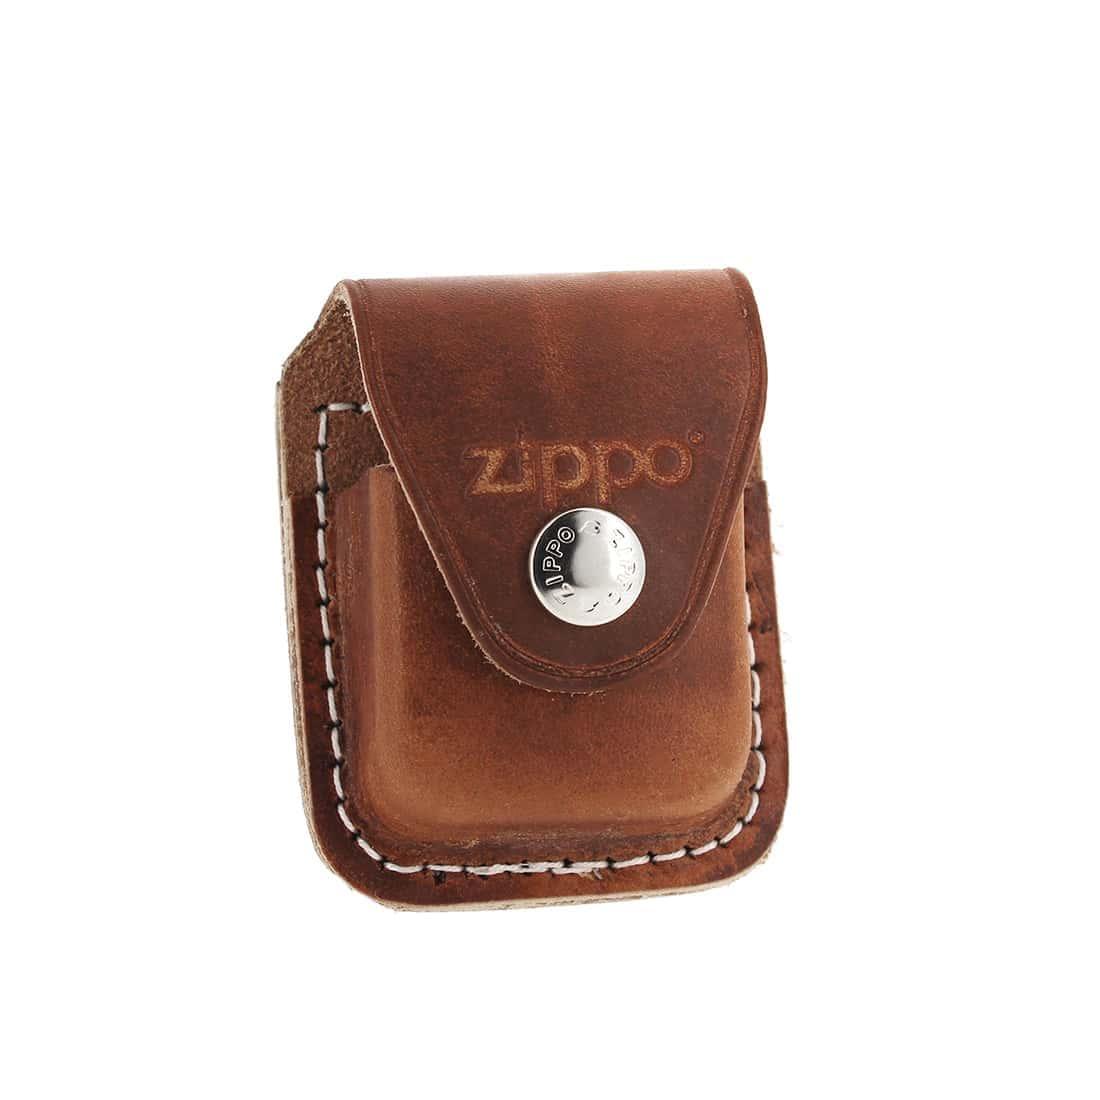 Zippo etui briquet cuir marron à clip 859008 - 18,00€ 55a68ad4333